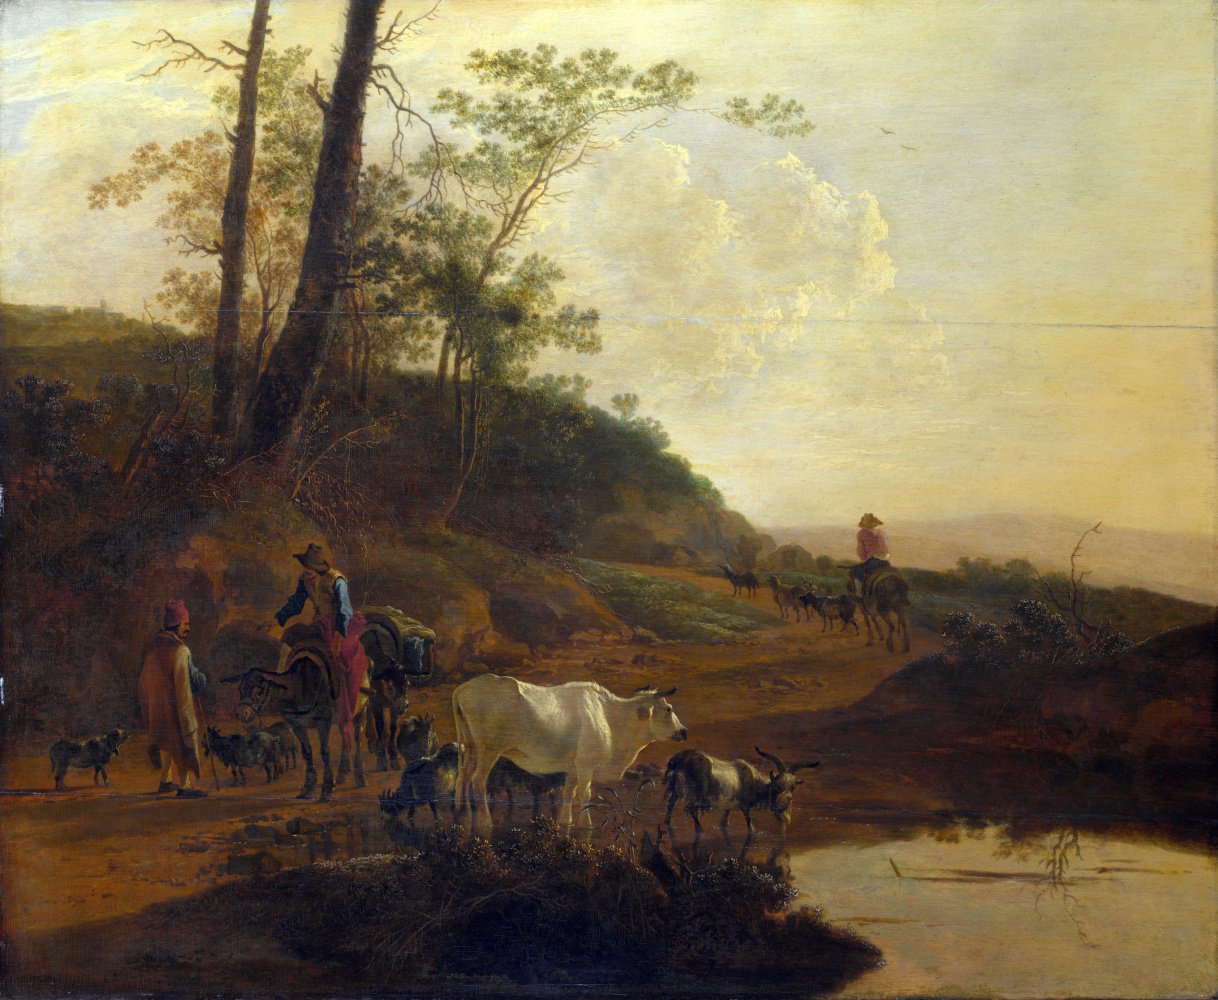 Ян ван Эйк. Рогатый скот и мужчины